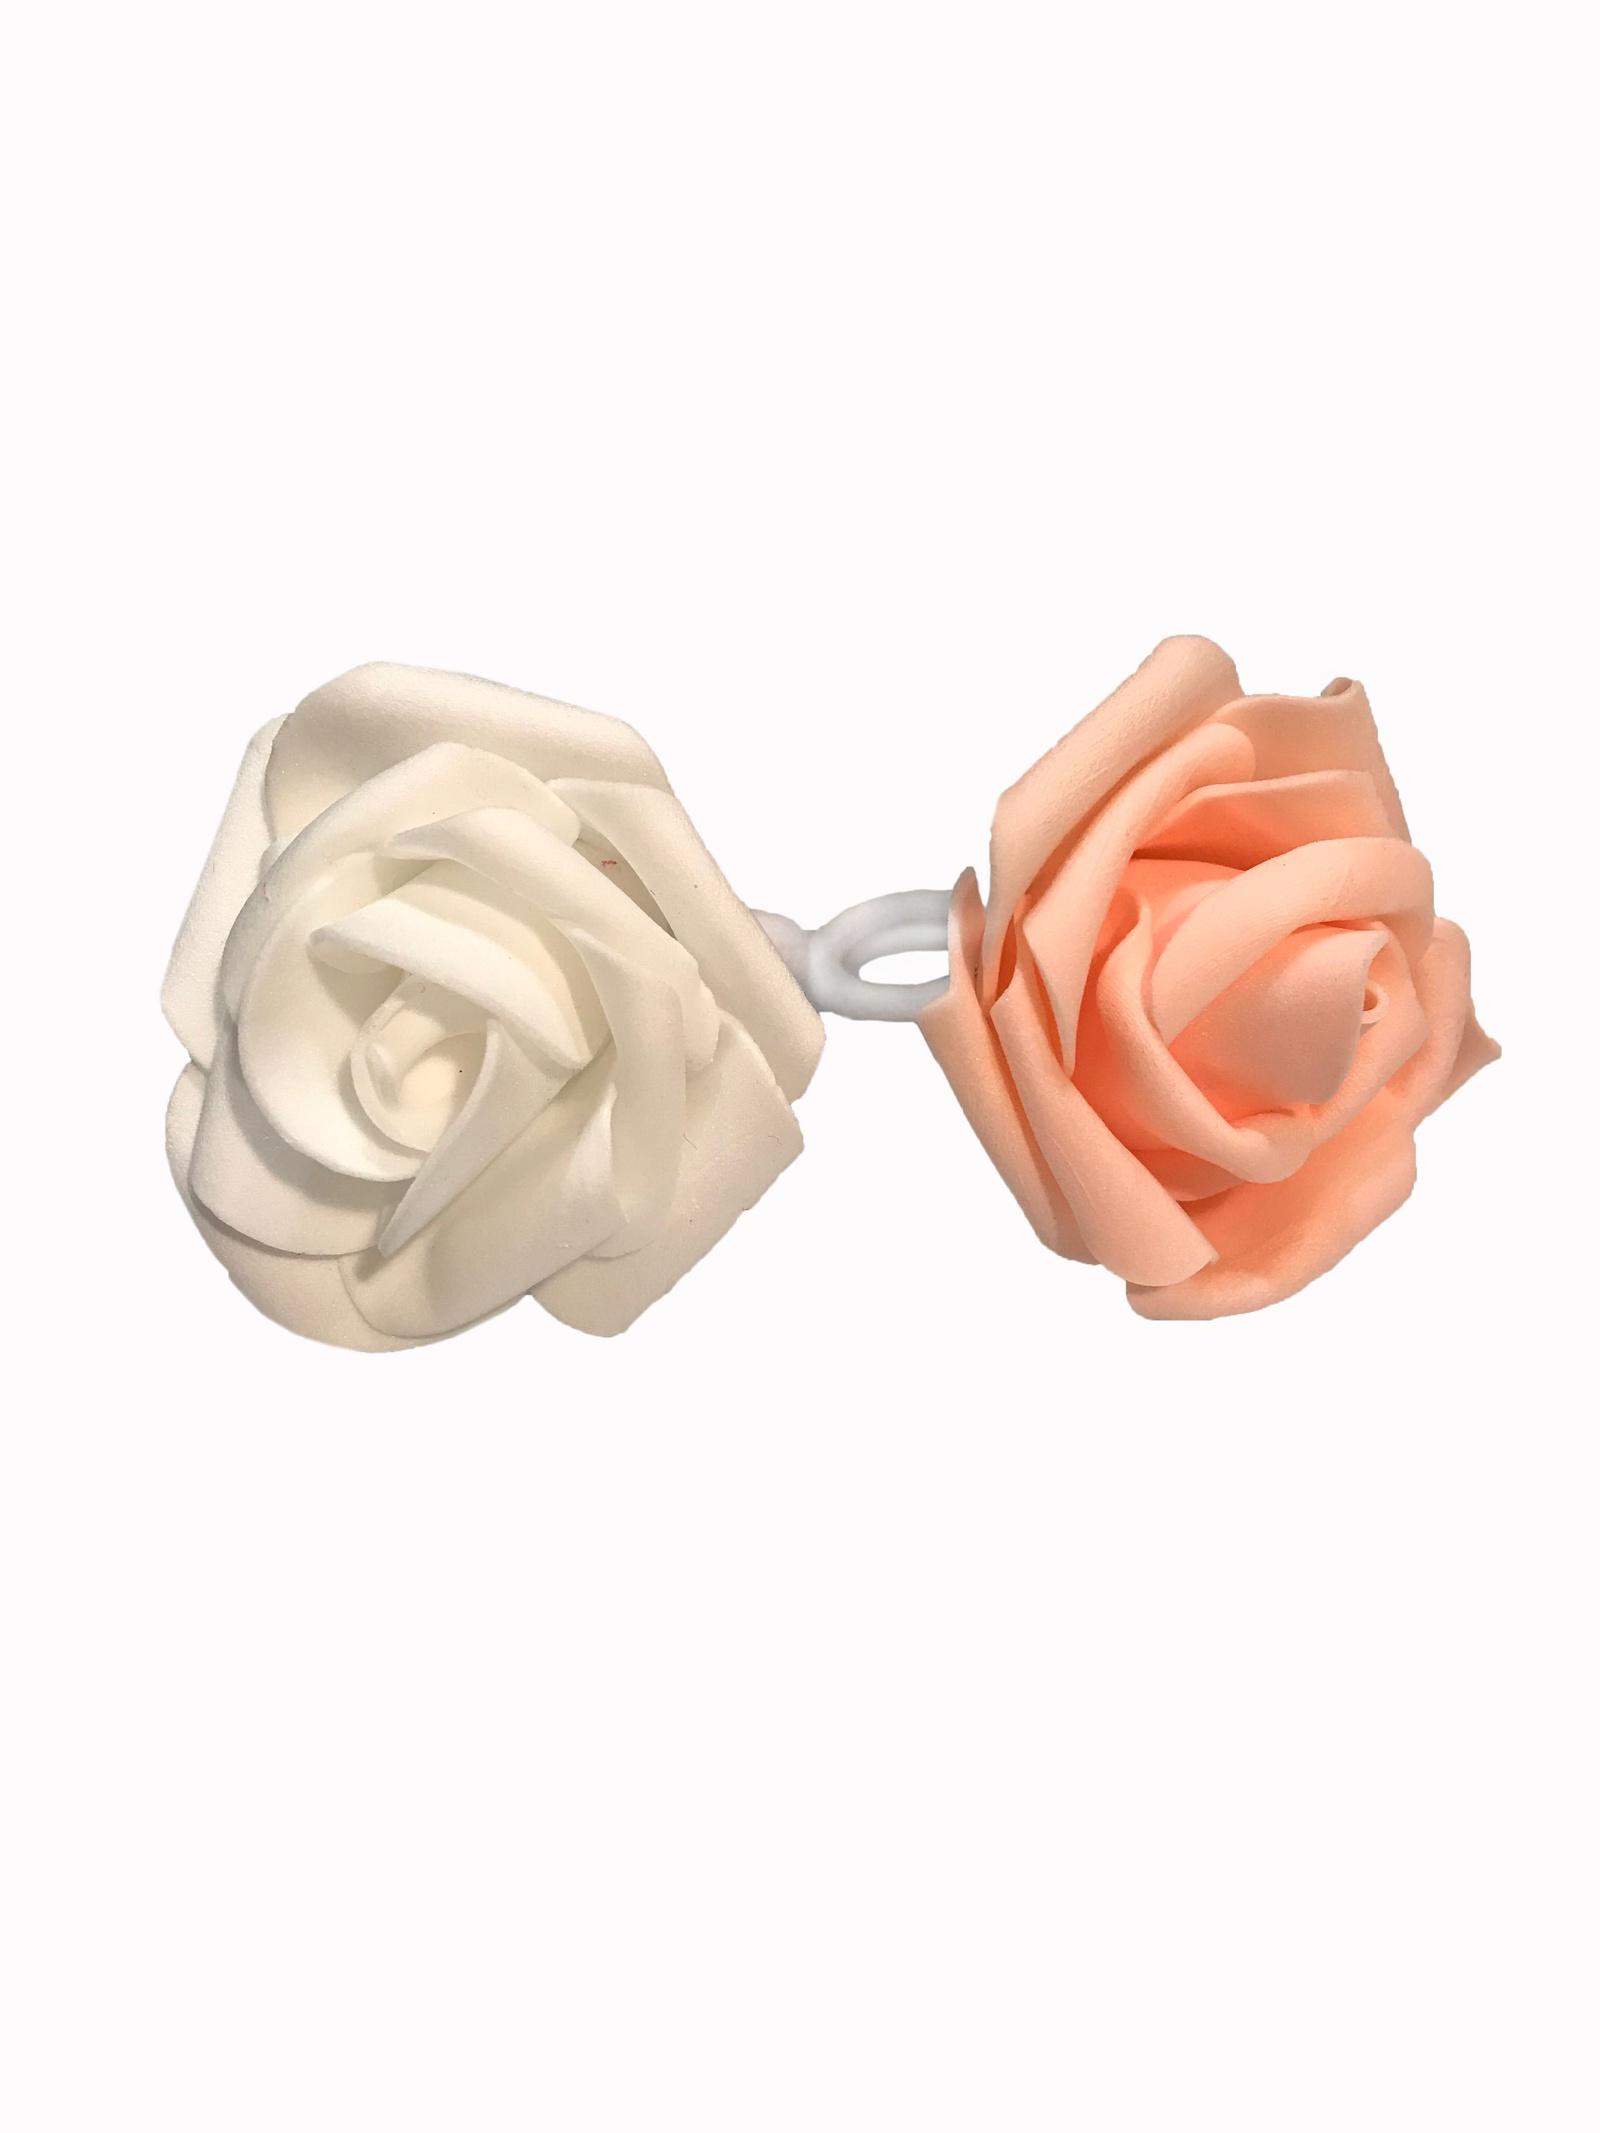 Резинка для волос Flowerstyle Набор резинок для волос Розочки, белый набор резинок для волос power